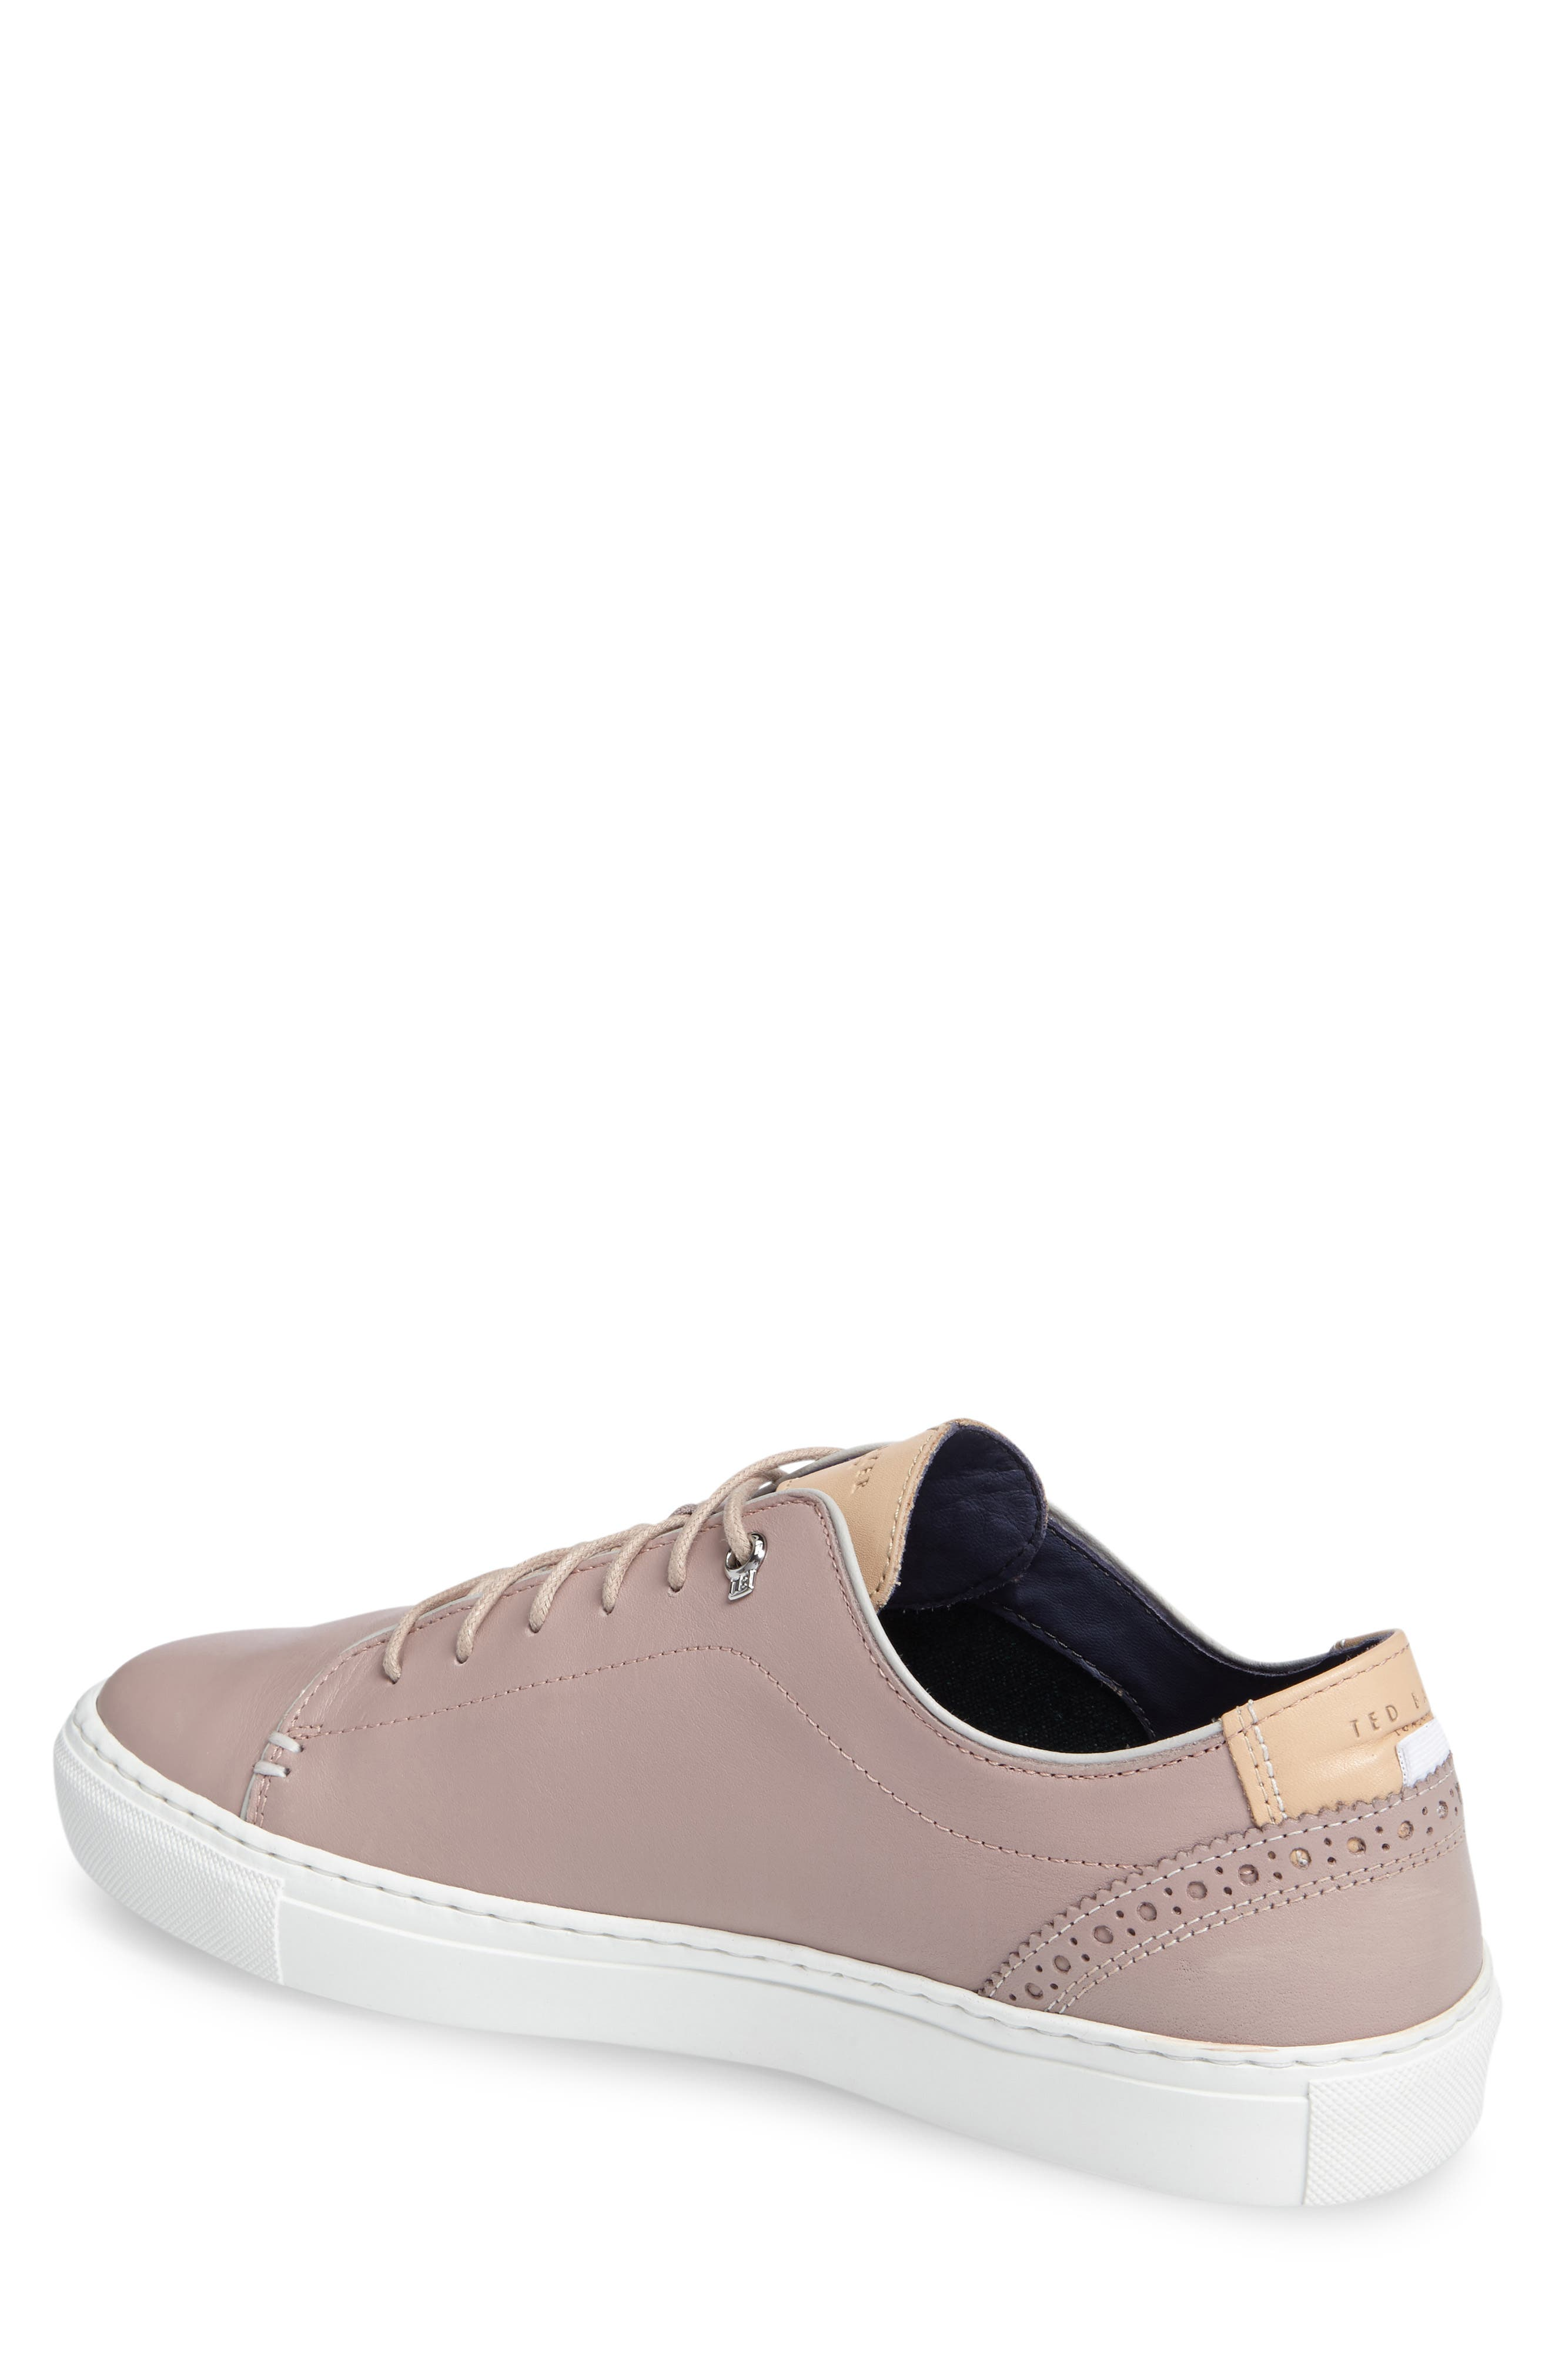 'Kiing Classic' Sneaker,                             Alternate thumbnail 23, color,